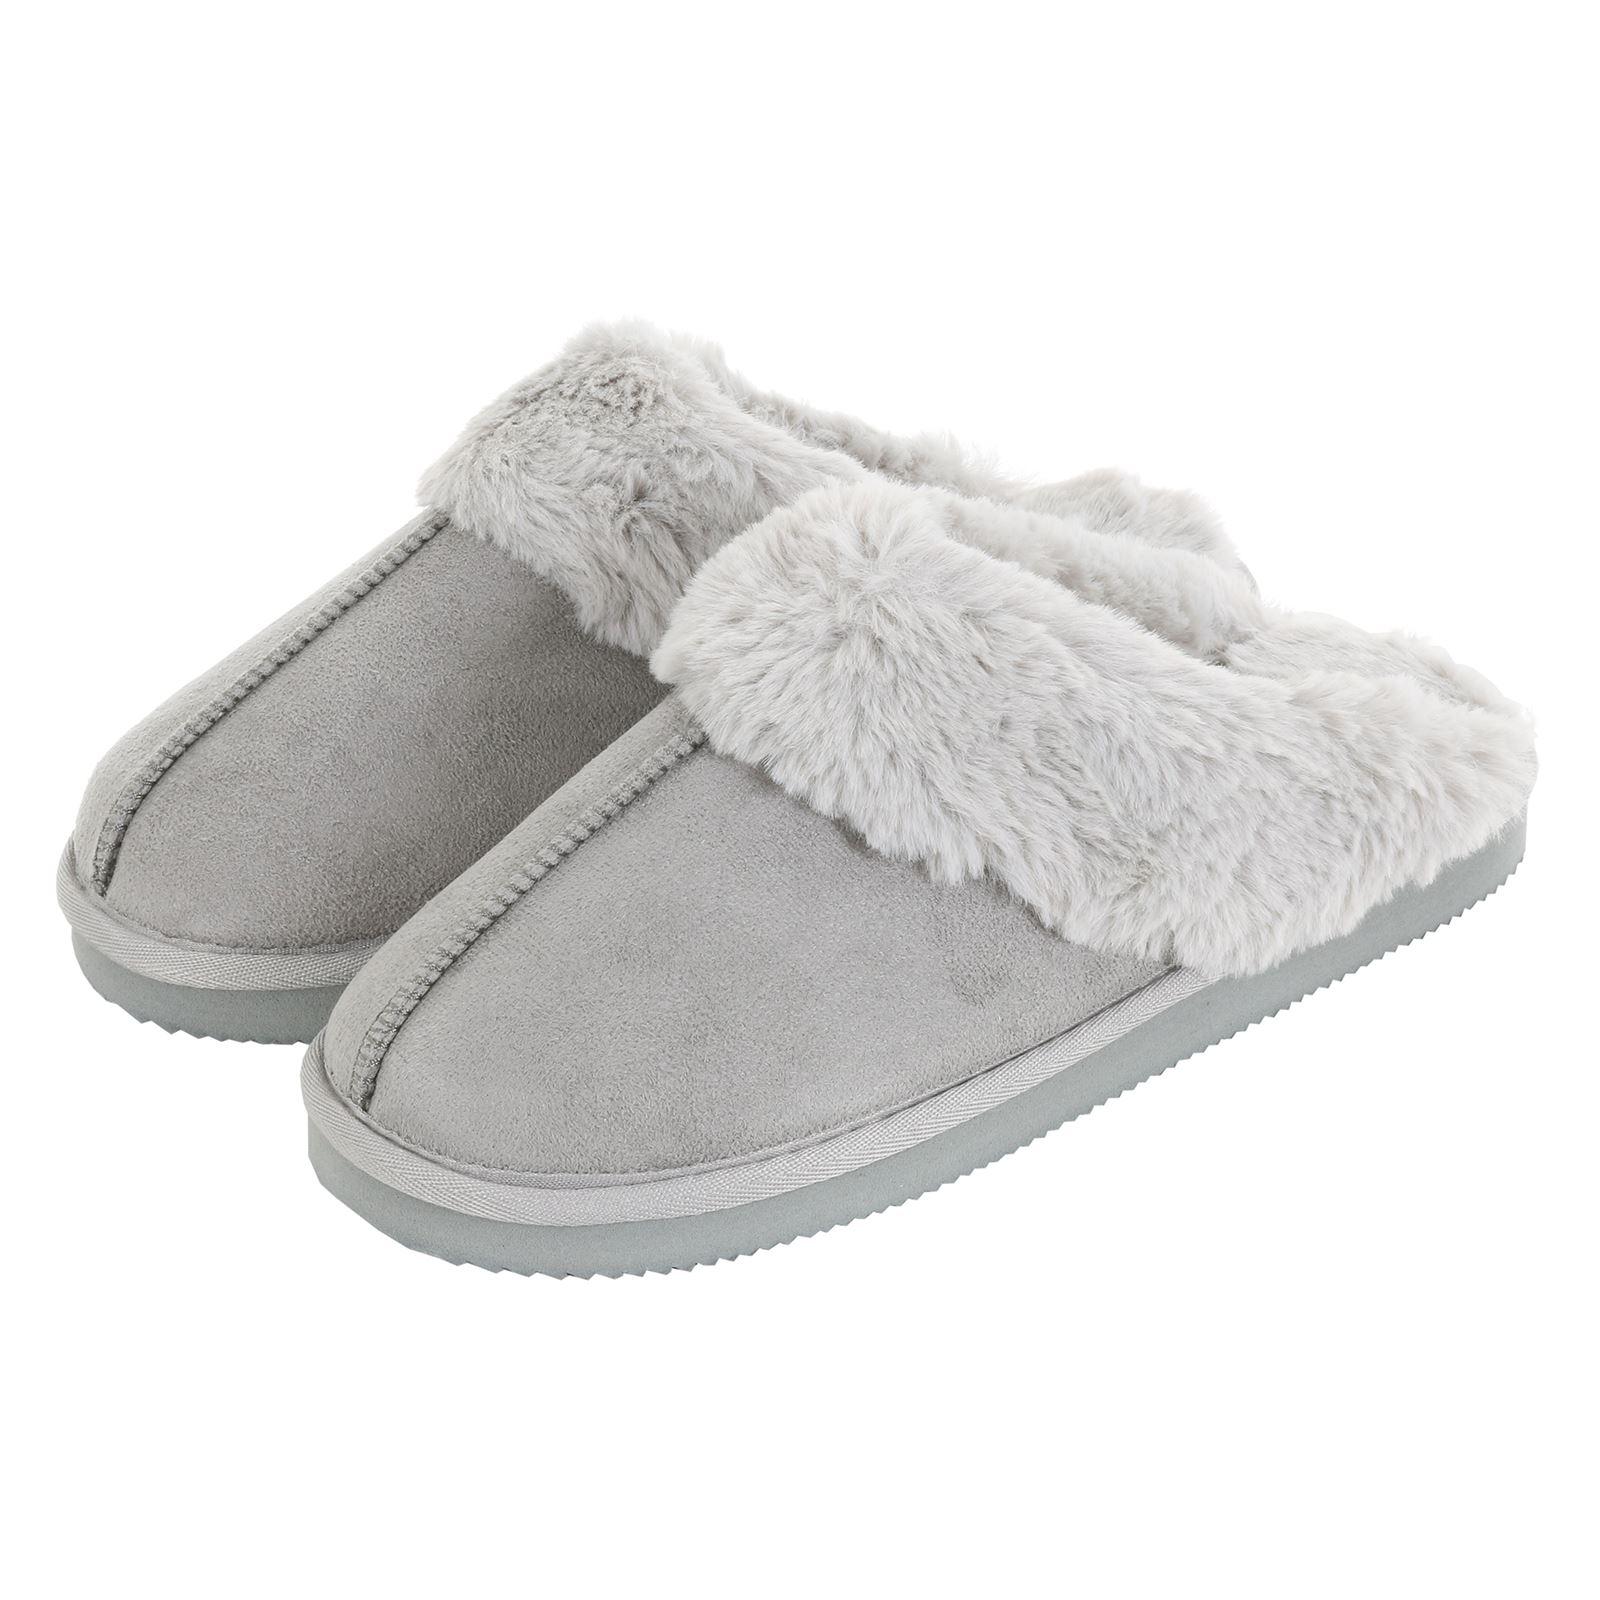 Geniune GCG Ladies Faux Sheepskin Slippers Mules Non Slip Hard Sole Womens GREY